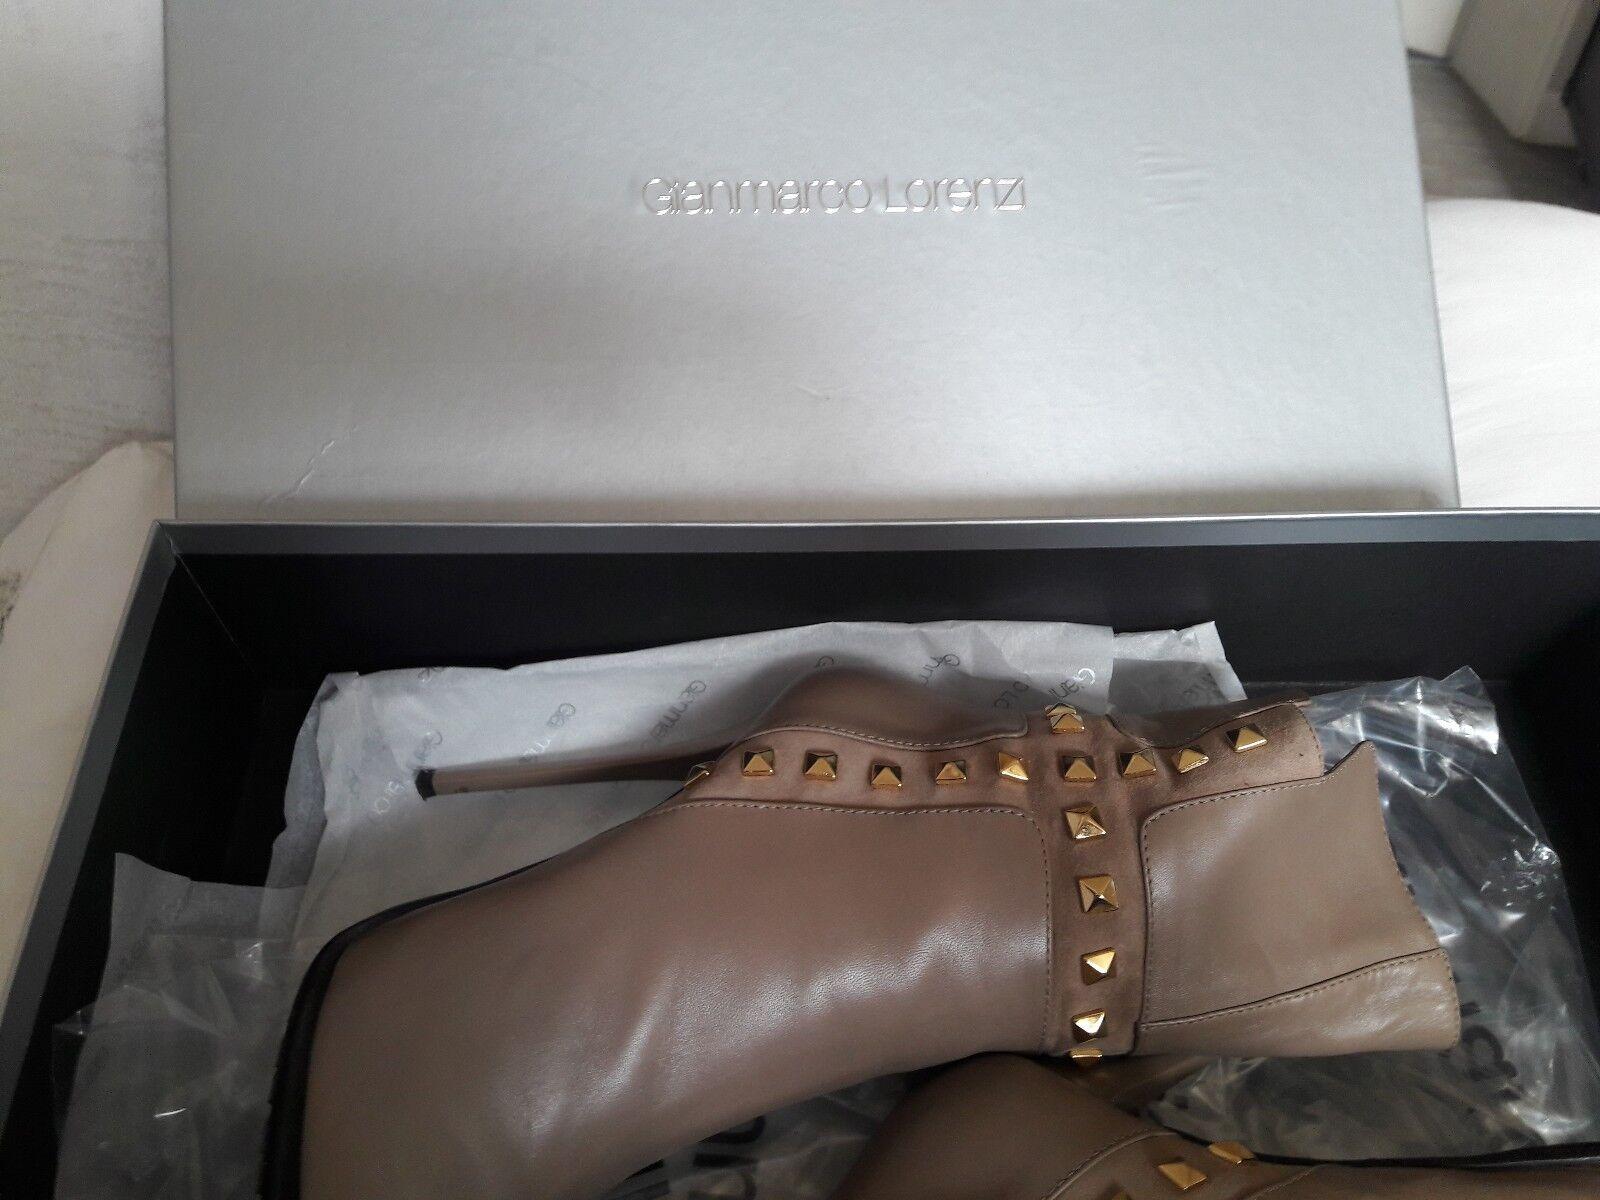 Gianmarco Gianmarco Gianmarco Lorenzi botines de cuero talla 37  barato y de alta calidad